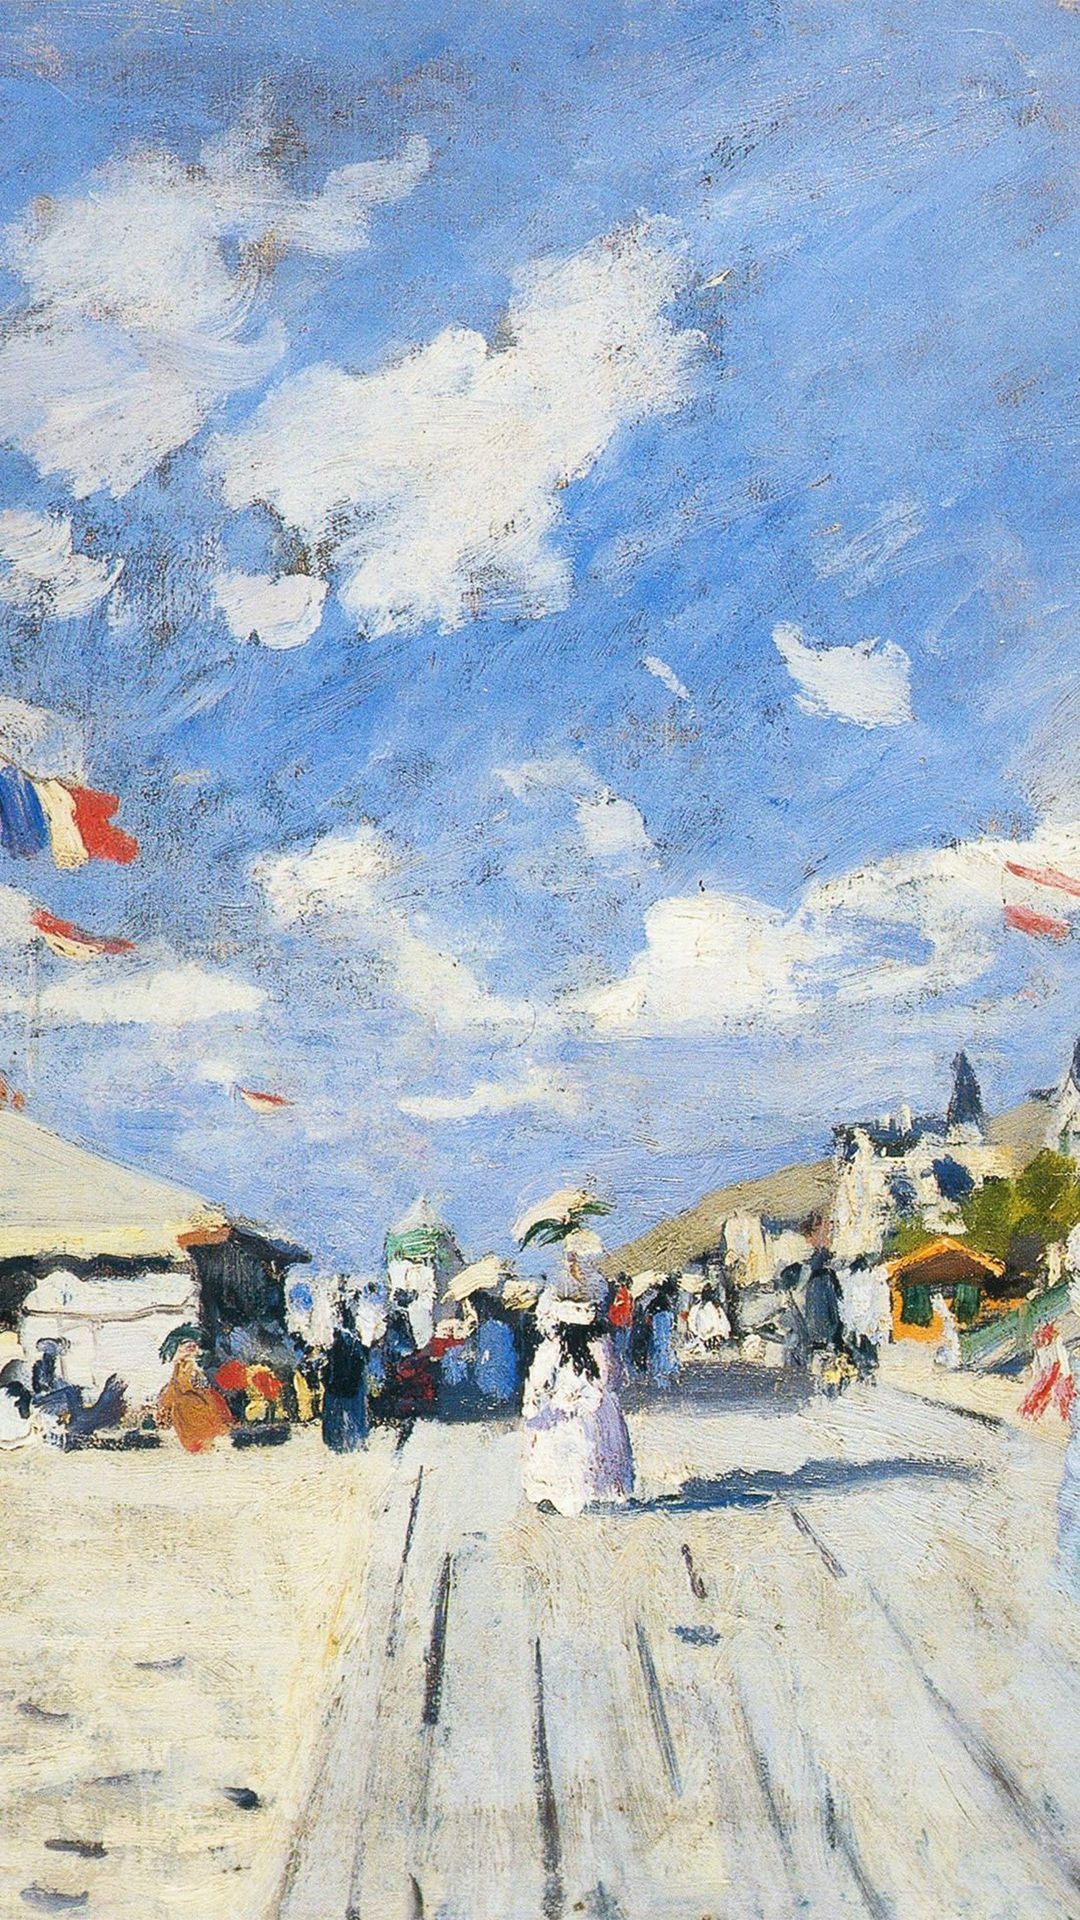 Classic Art Paint Board Walk On Claude Winter Snow